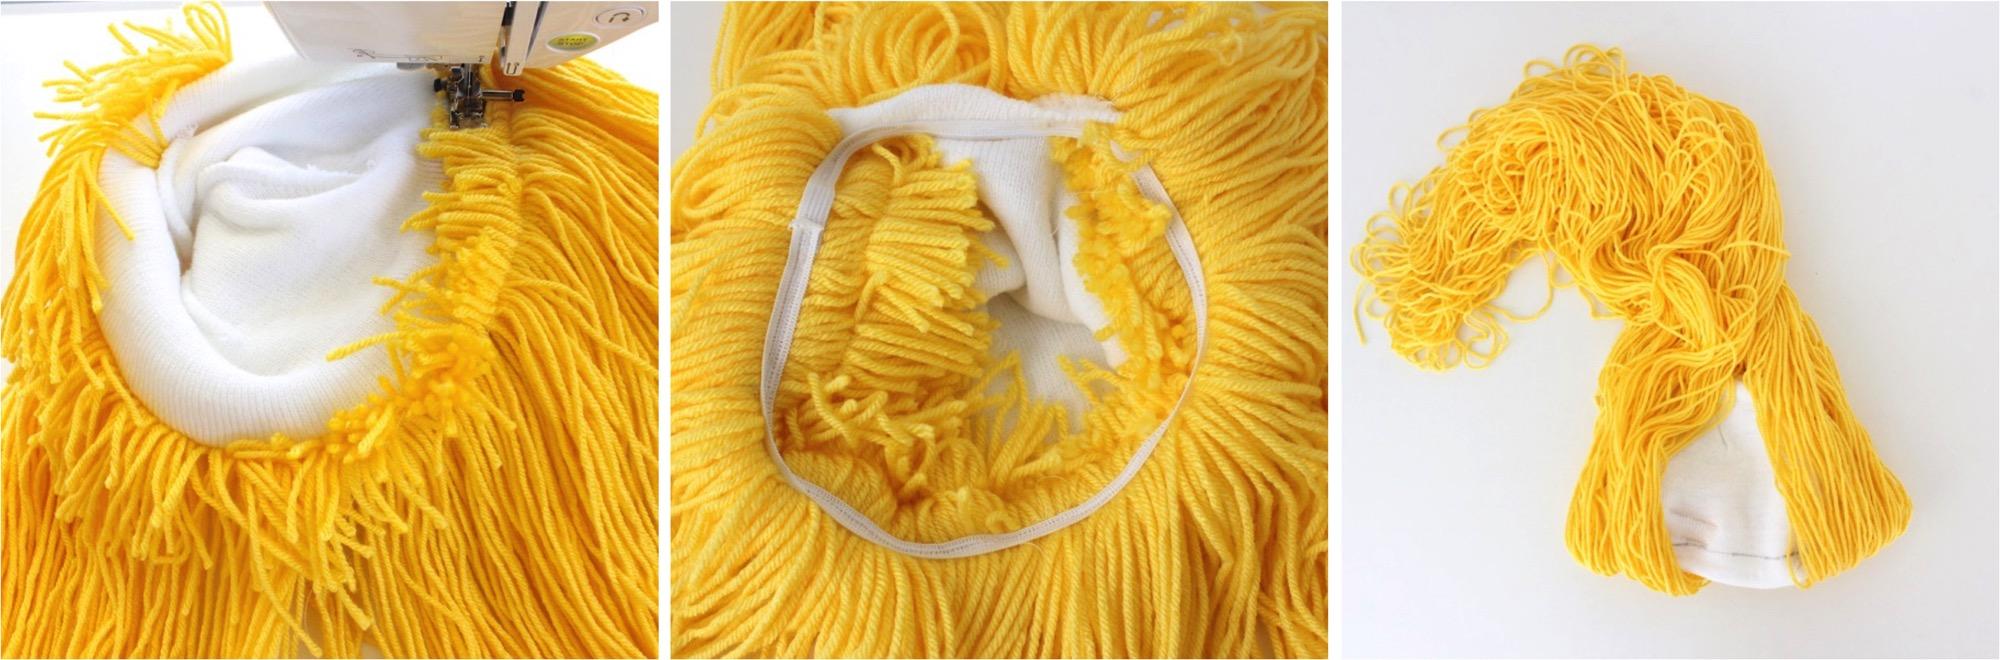 Making A Homemade Yarn Wig 113